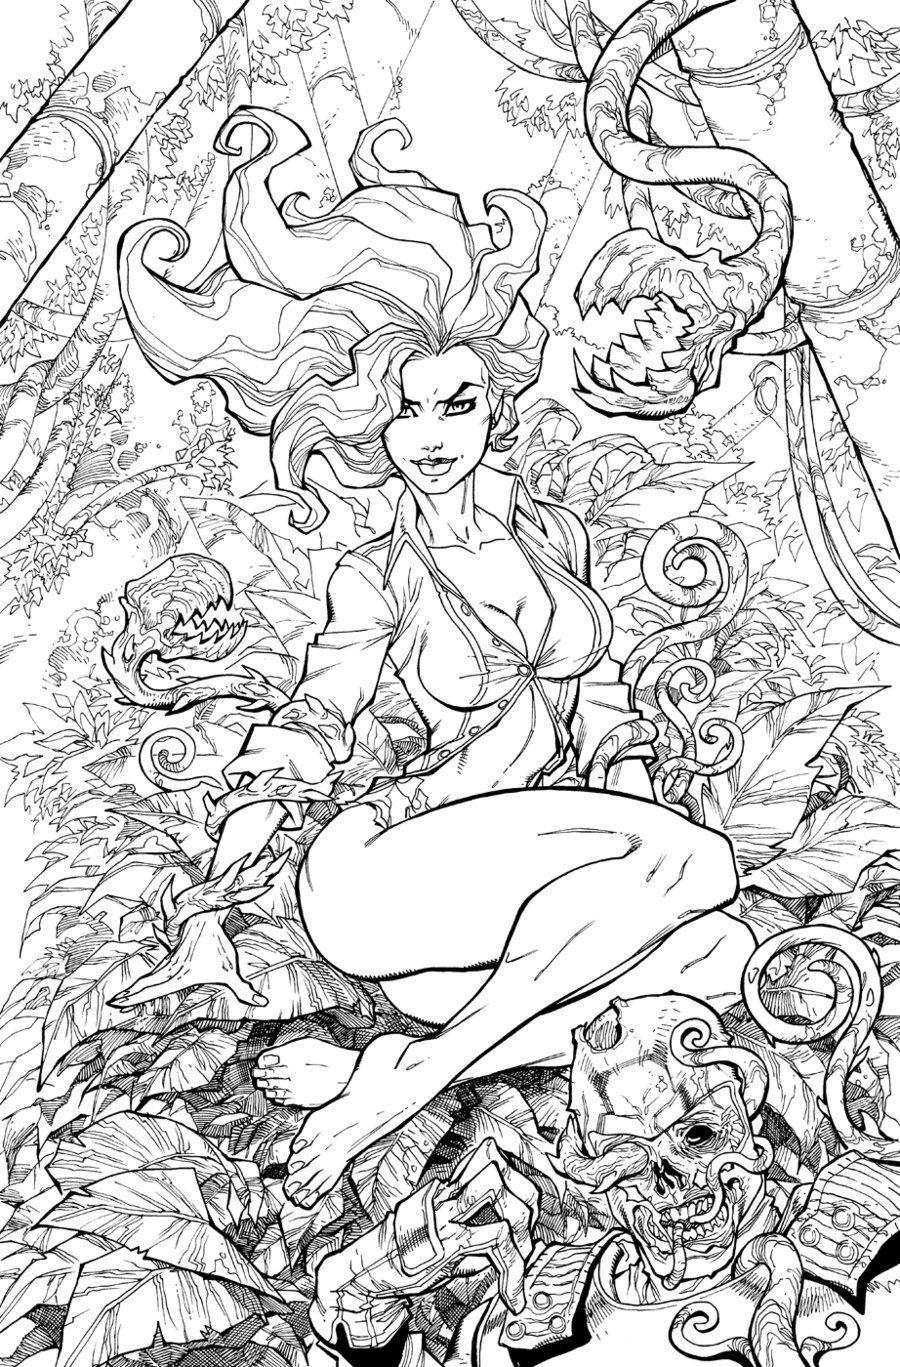 ArkhamCity Poison Ivy by Chuckdee.deviantart.com on ...